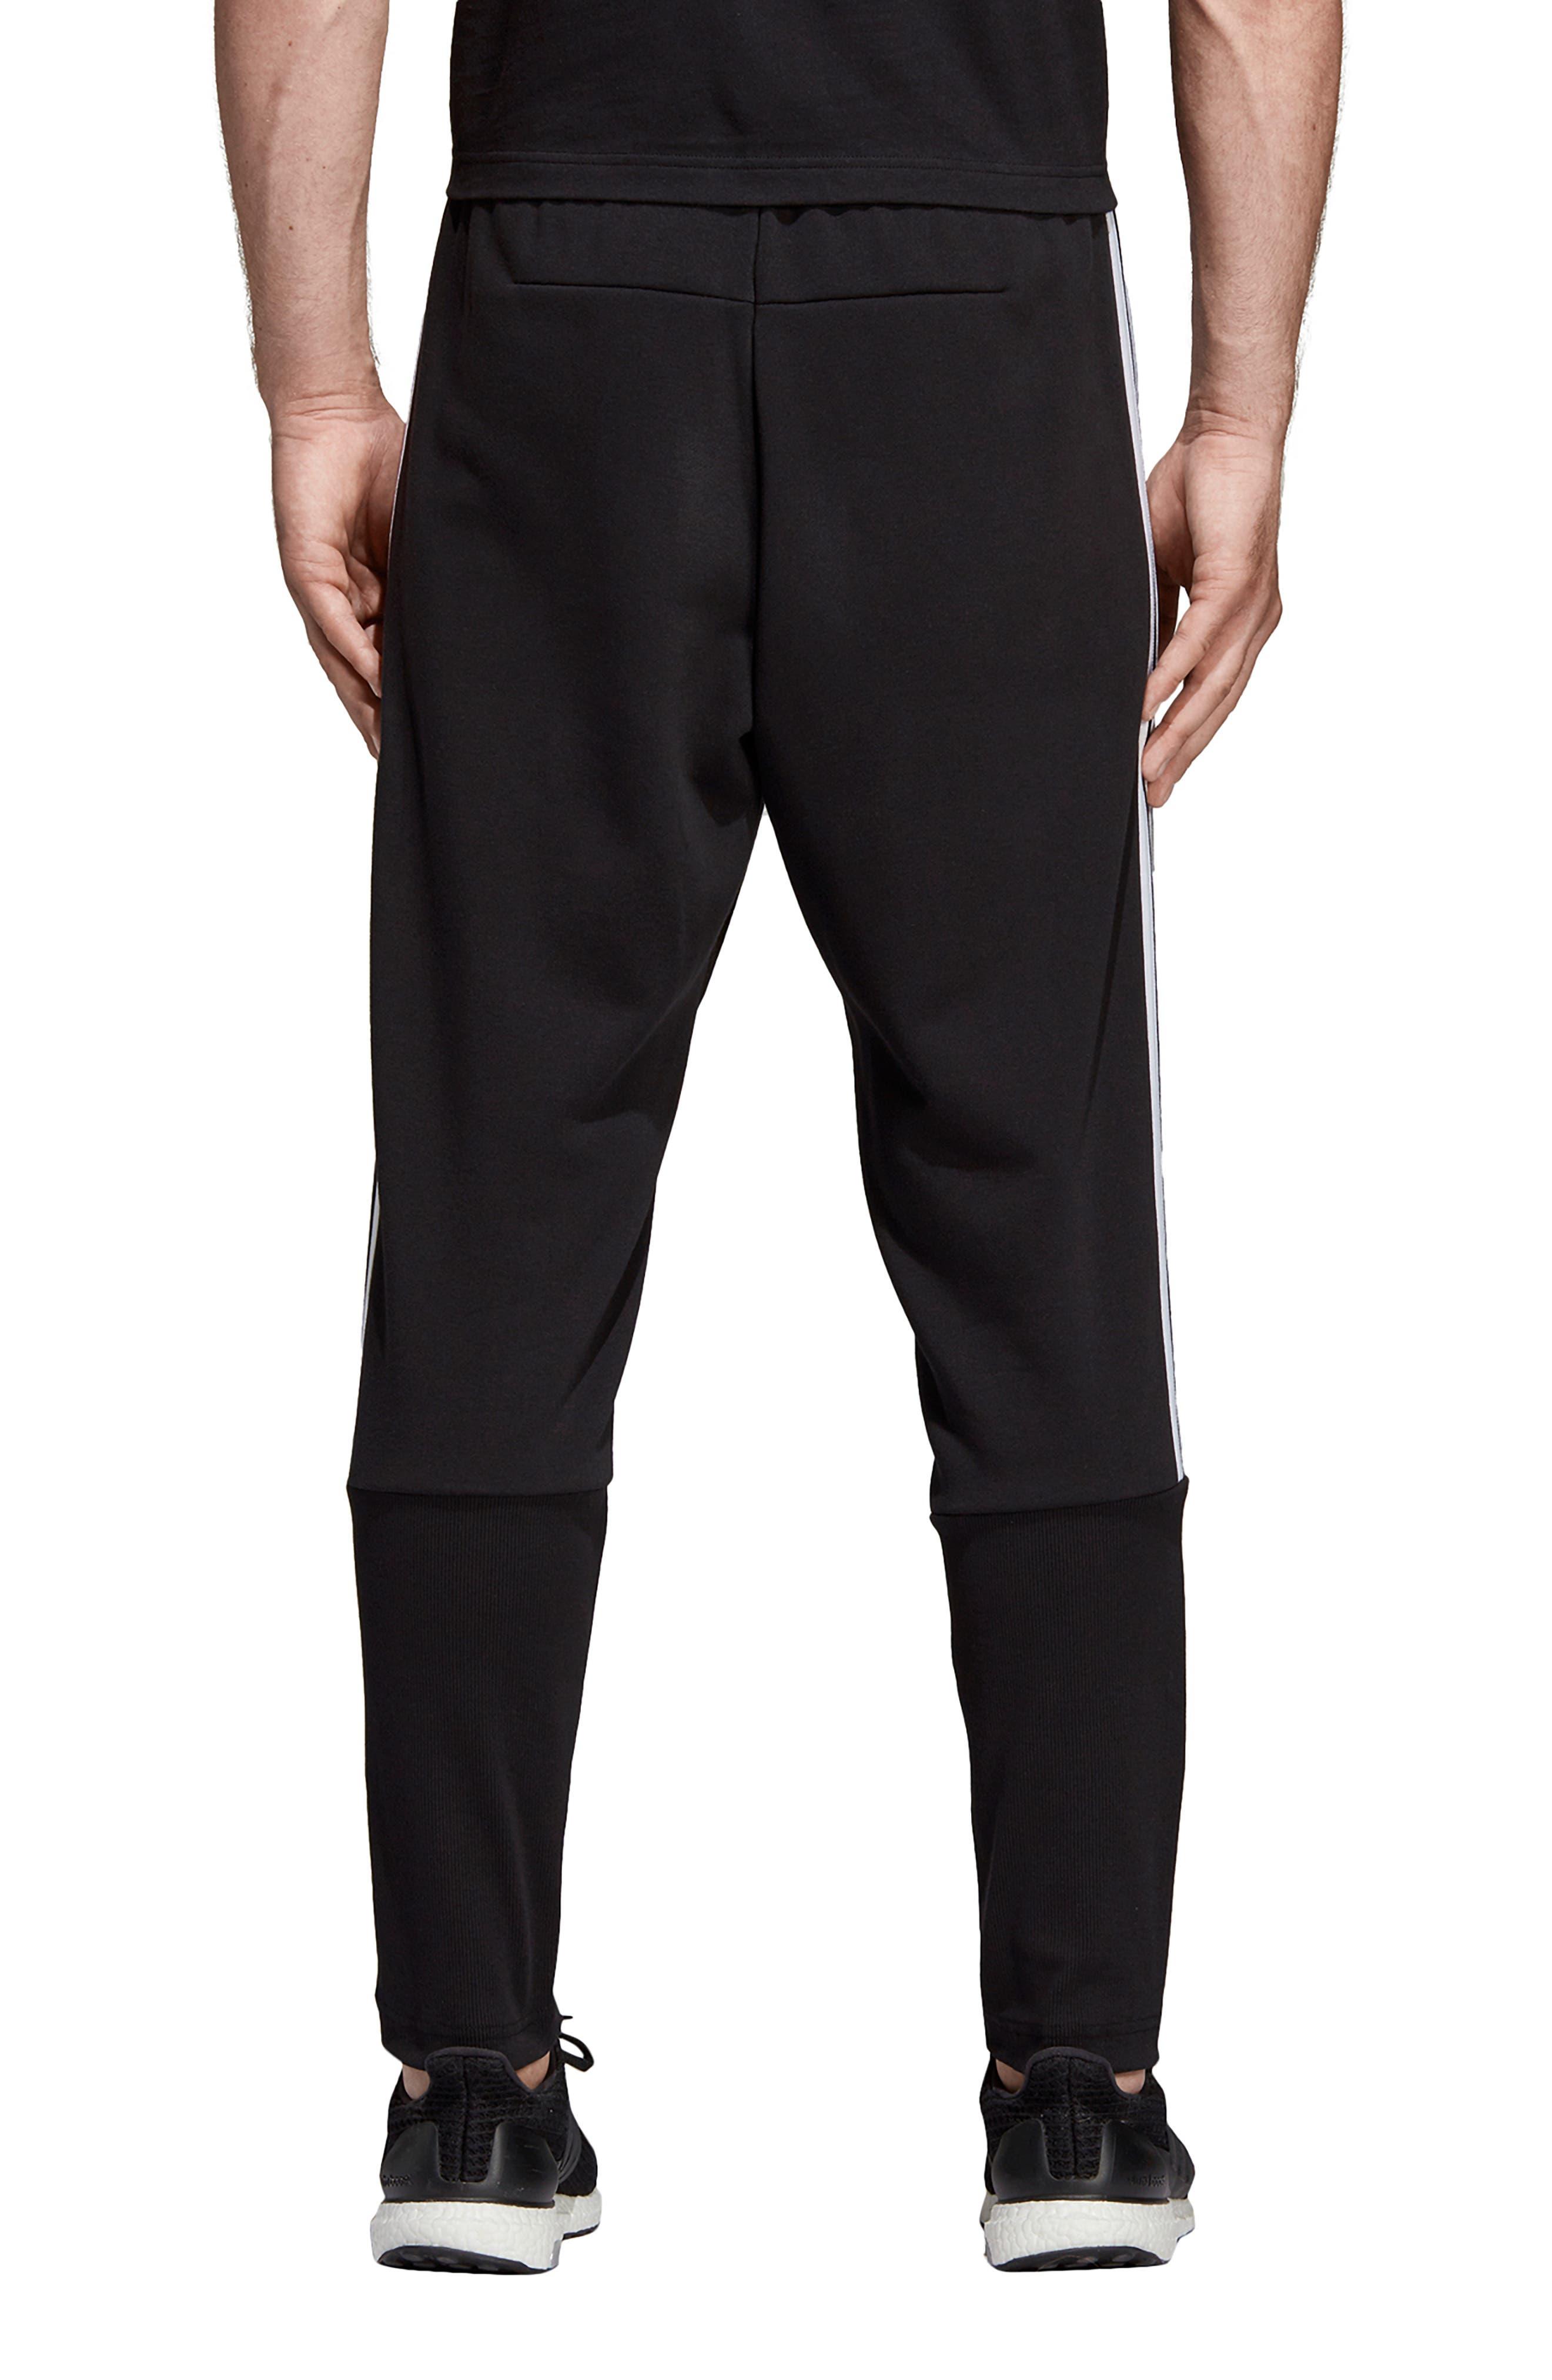 ADIDAS,                             MH 3S Tiro Sweatpants,                             Alternate thumbnail 2, color,                             BLACK/ WHITE